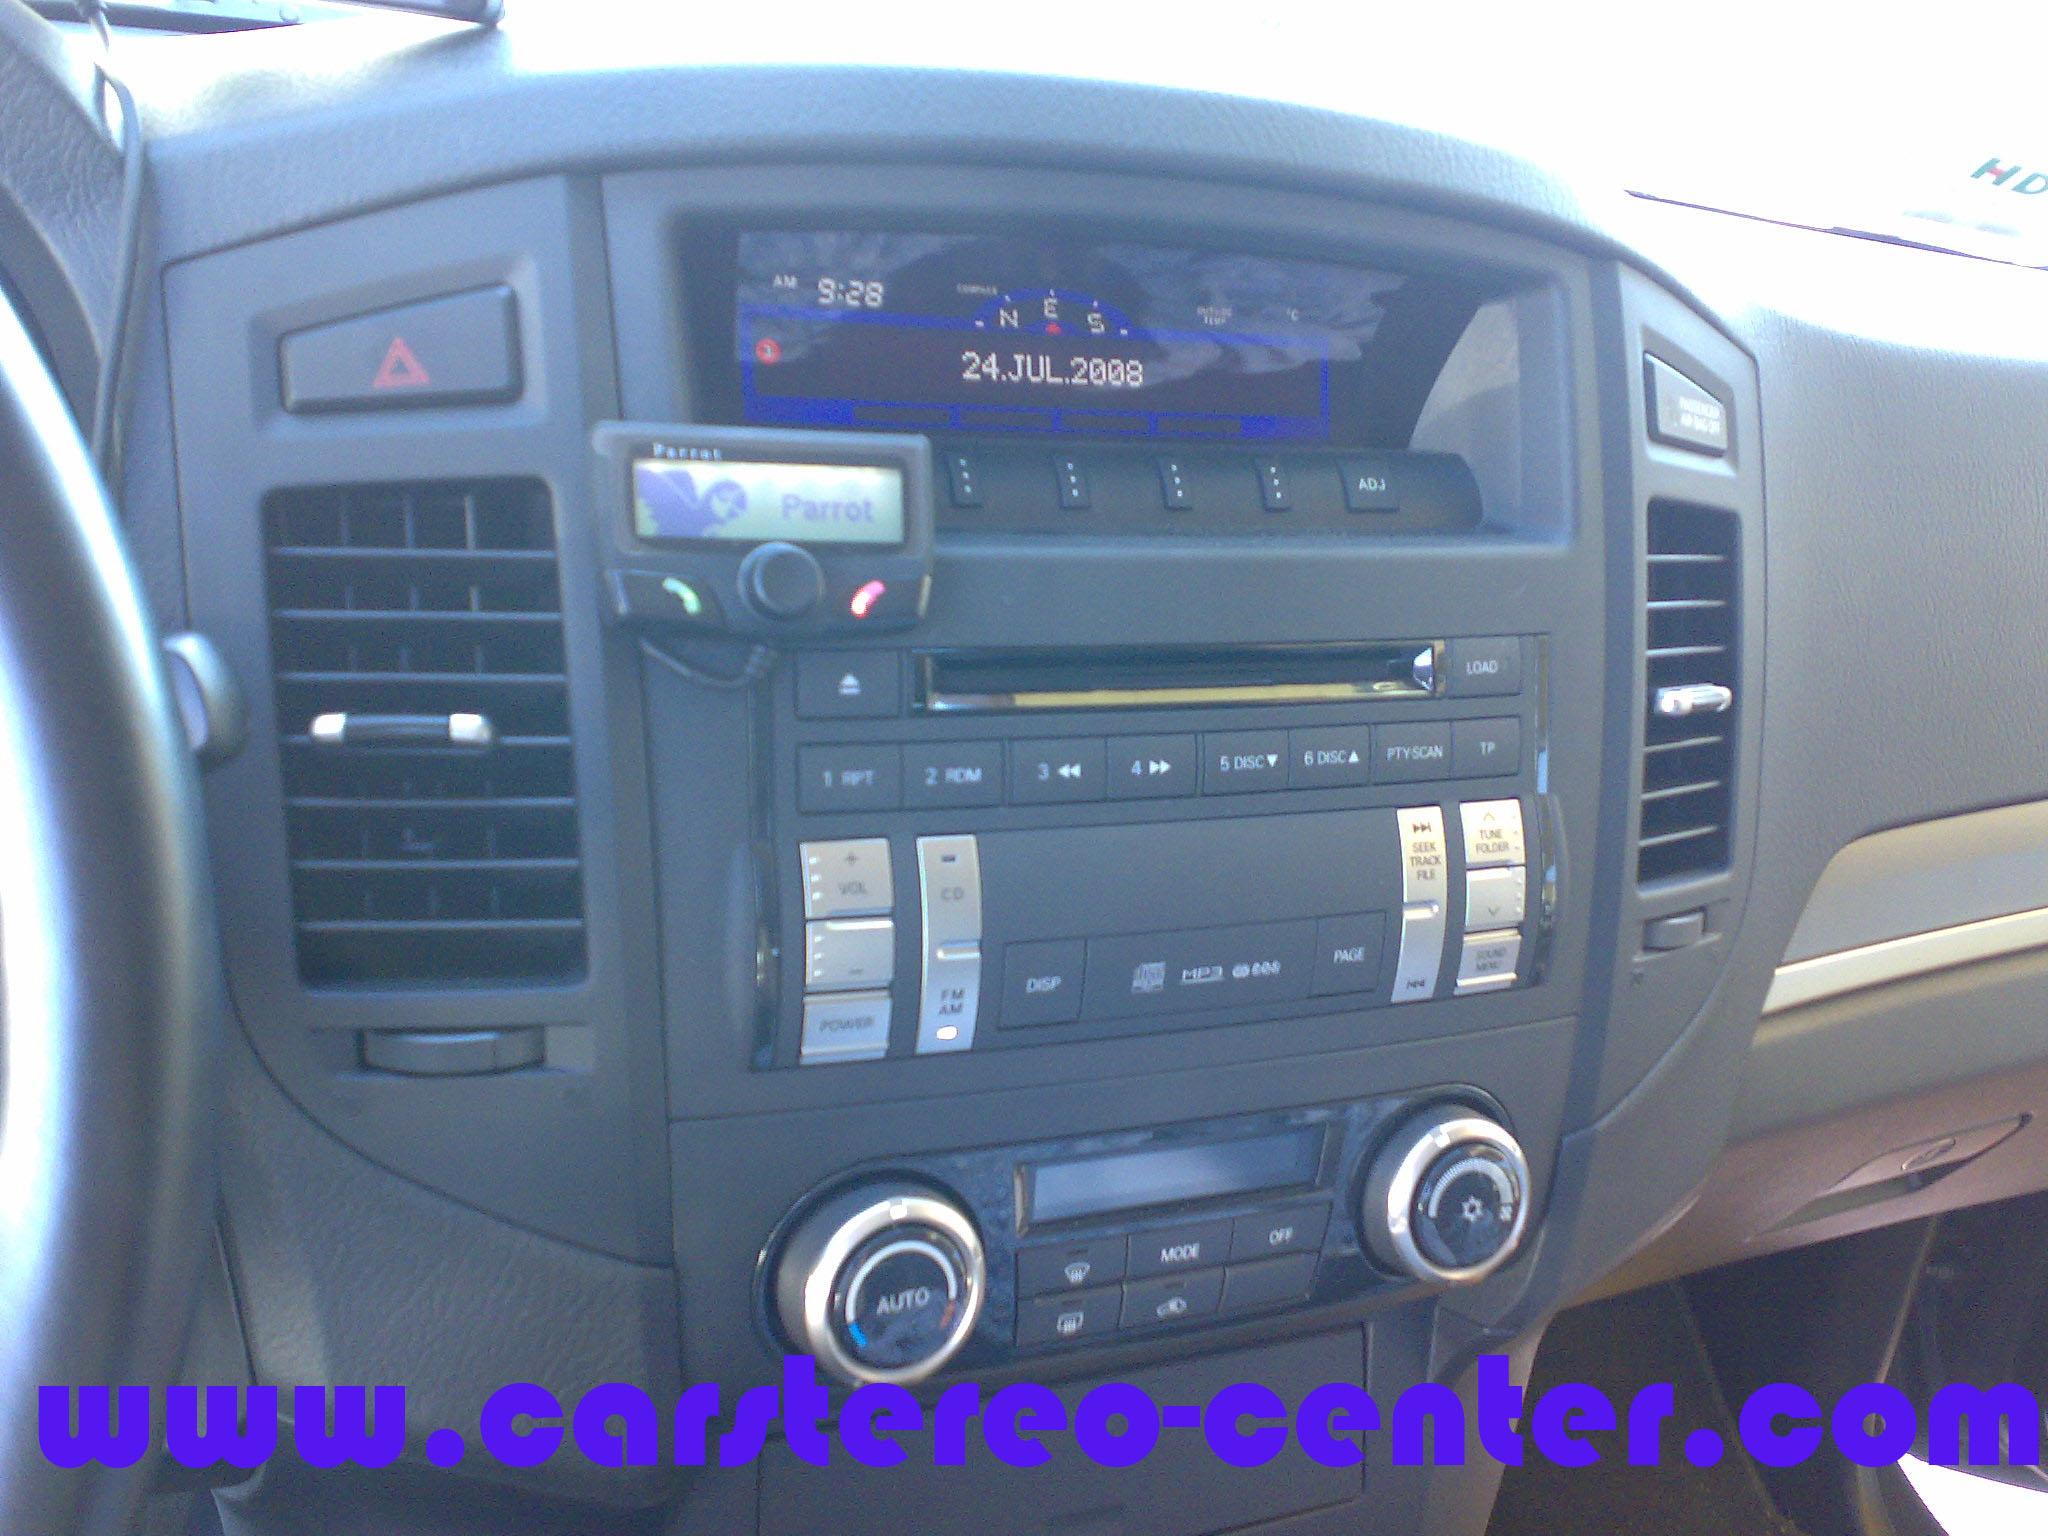 Installazioni navigatori, bluetooth, sensori, taxi